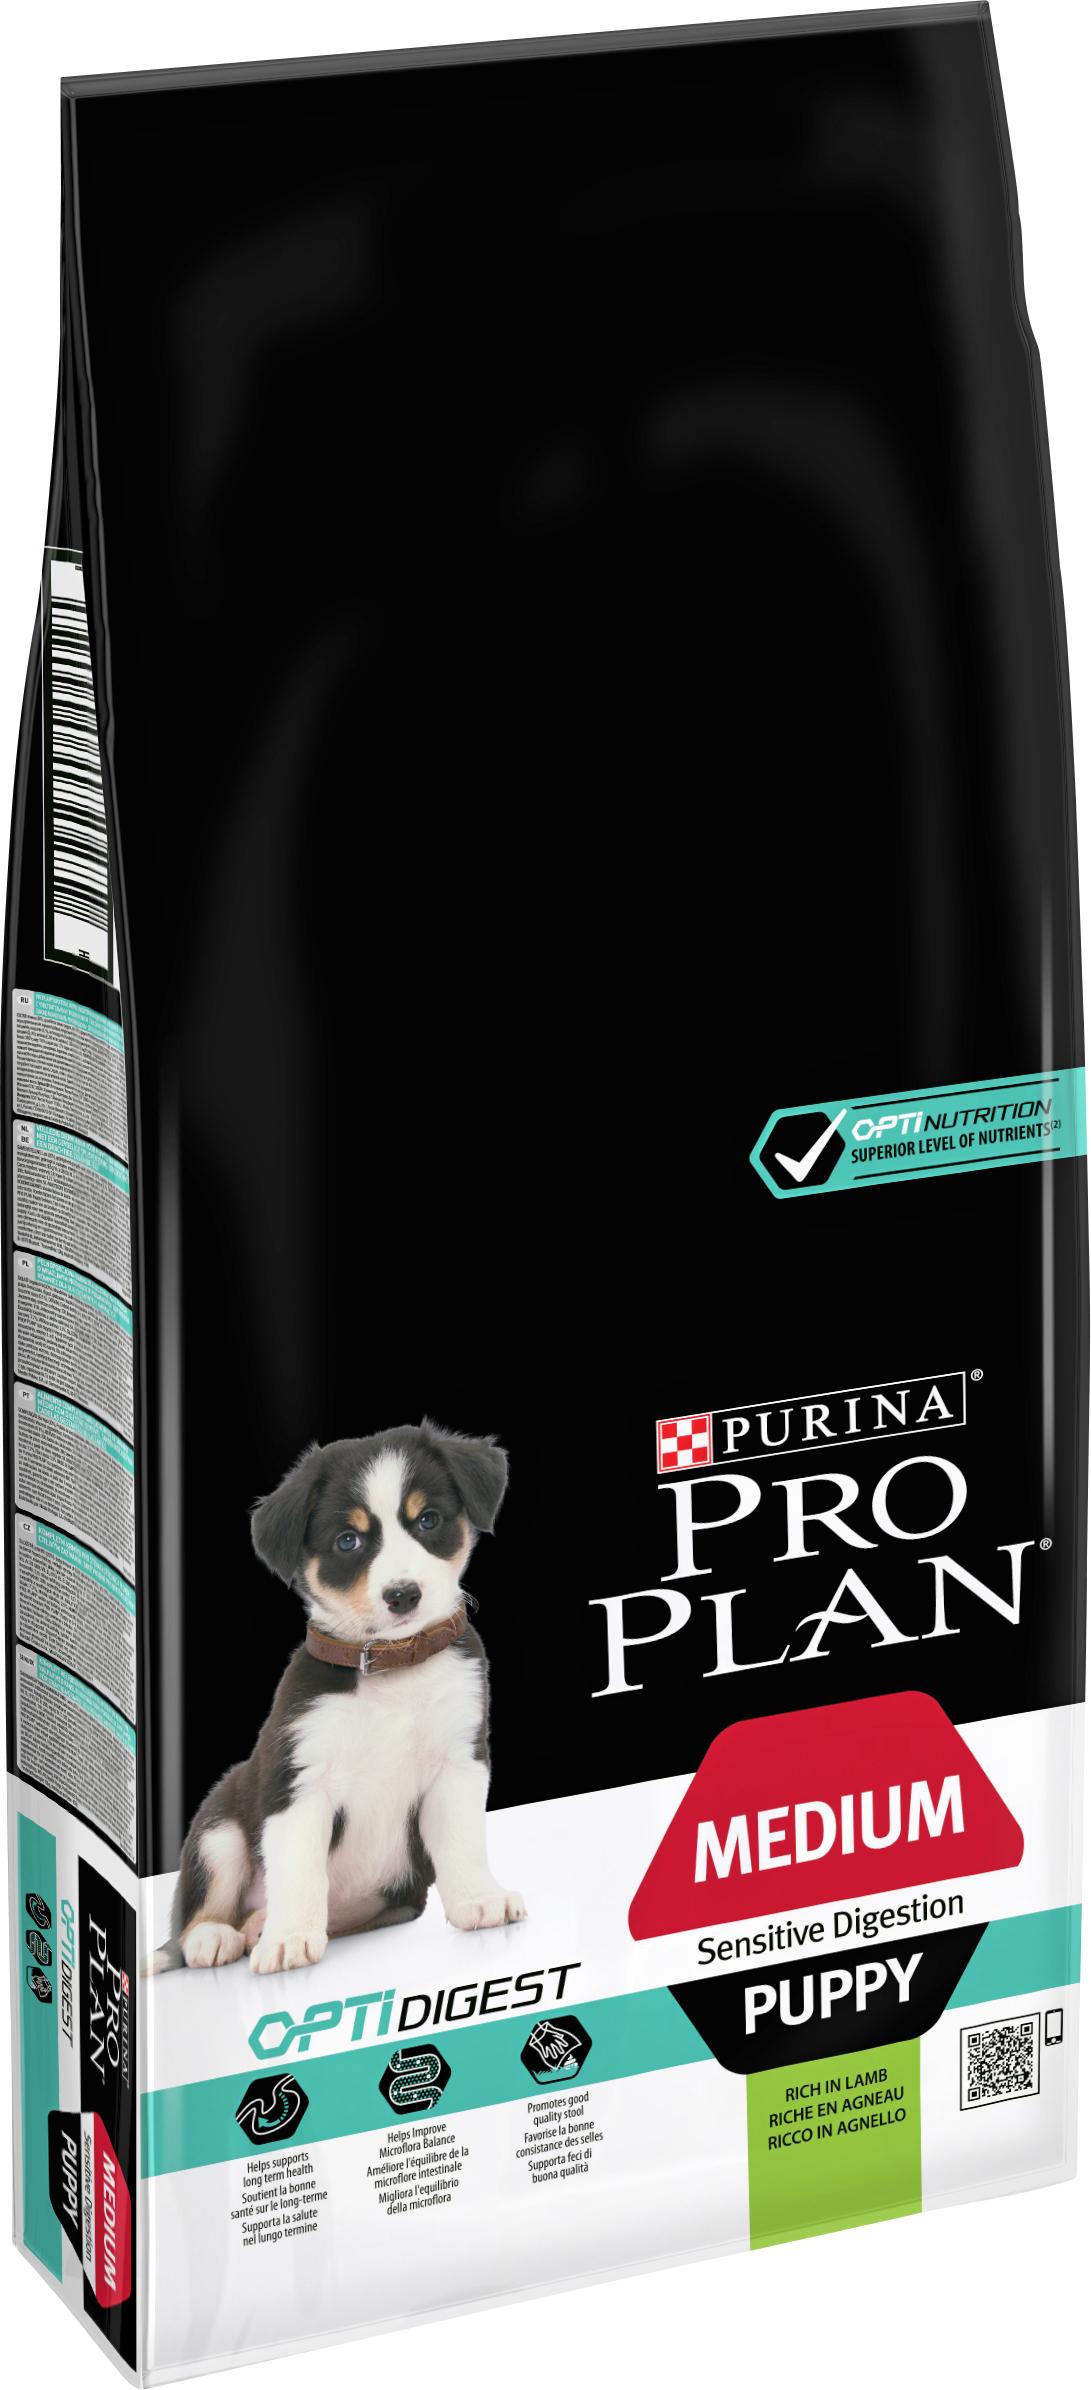 Hundfoder Pro Plan Medium Puppy Sensitive Digestion, 12 kg